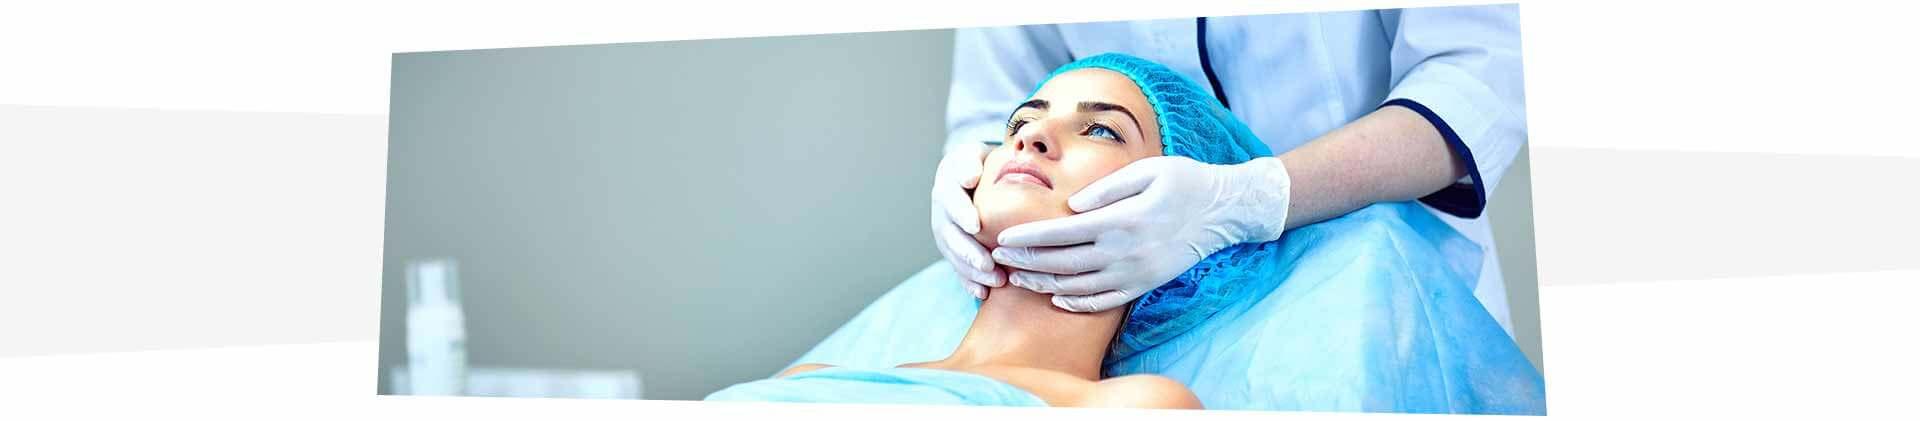 Marketing for Aesthetic Clinics